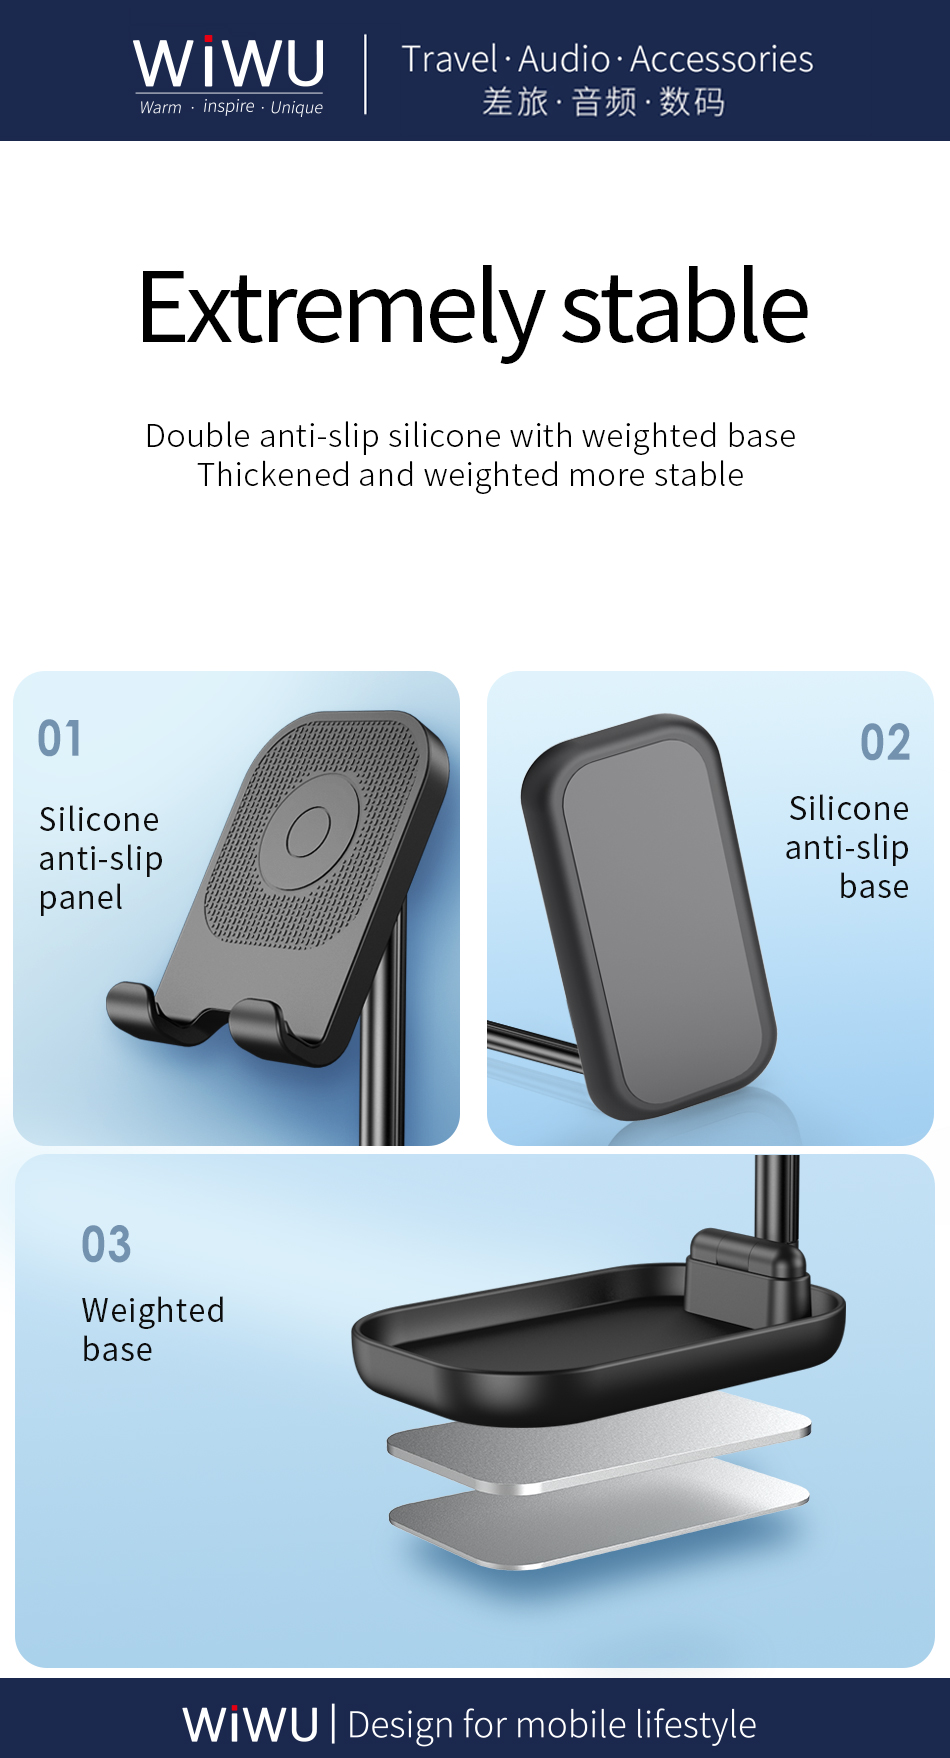 WiWU ZM100 Black ABS Aluminum alloy Adjustable Desktop Holder Stand Fo